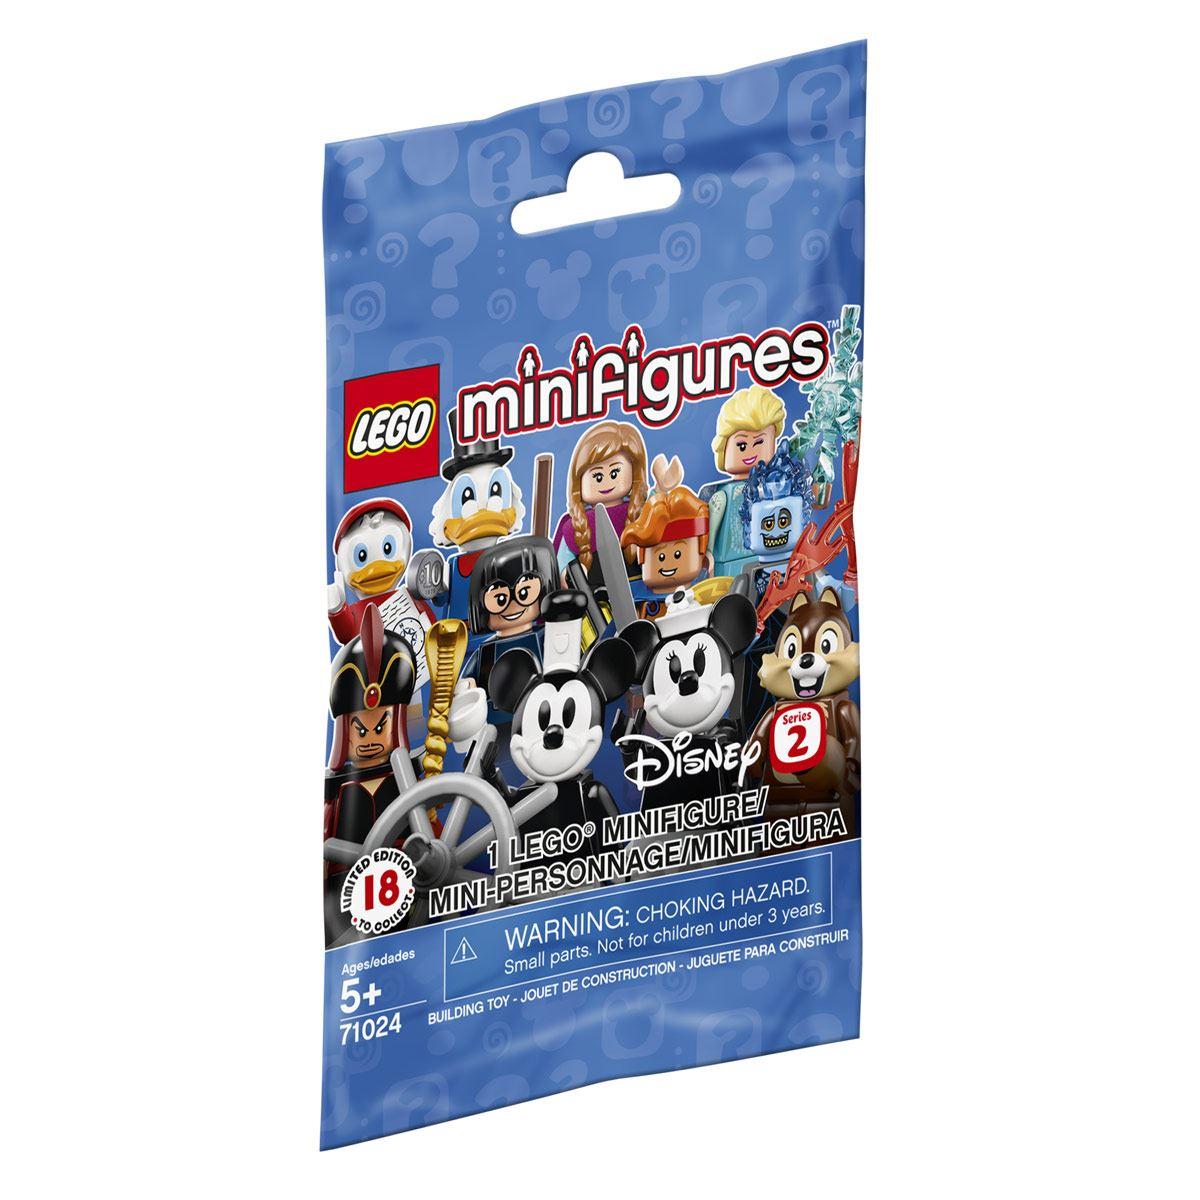 Figura De Accion Lego Minifigura Edicion Limitada Disney 18